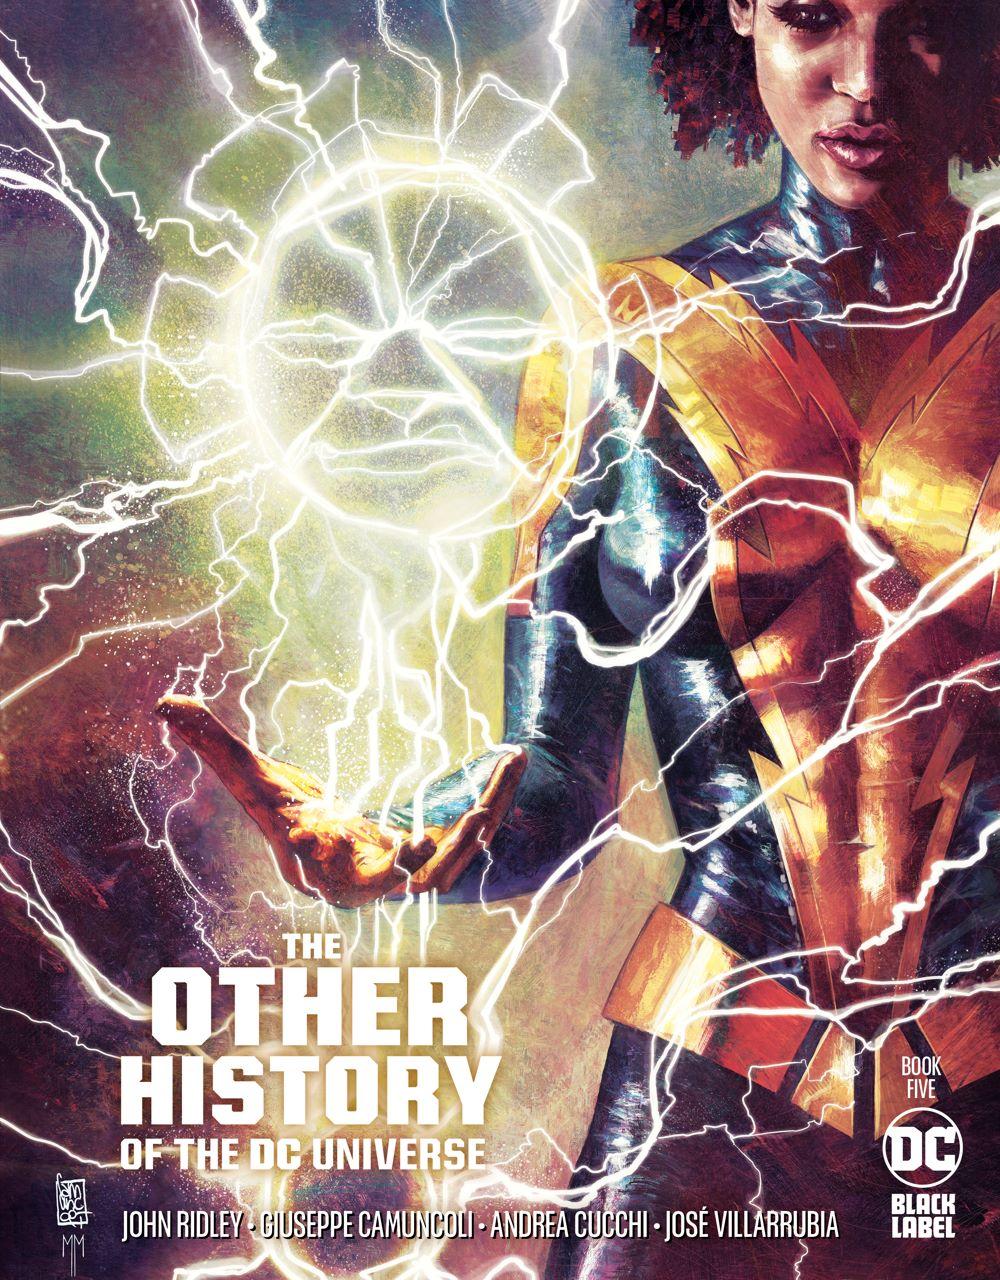 OHotDCU_Cv5 DC Comics July 2021 Solicitations